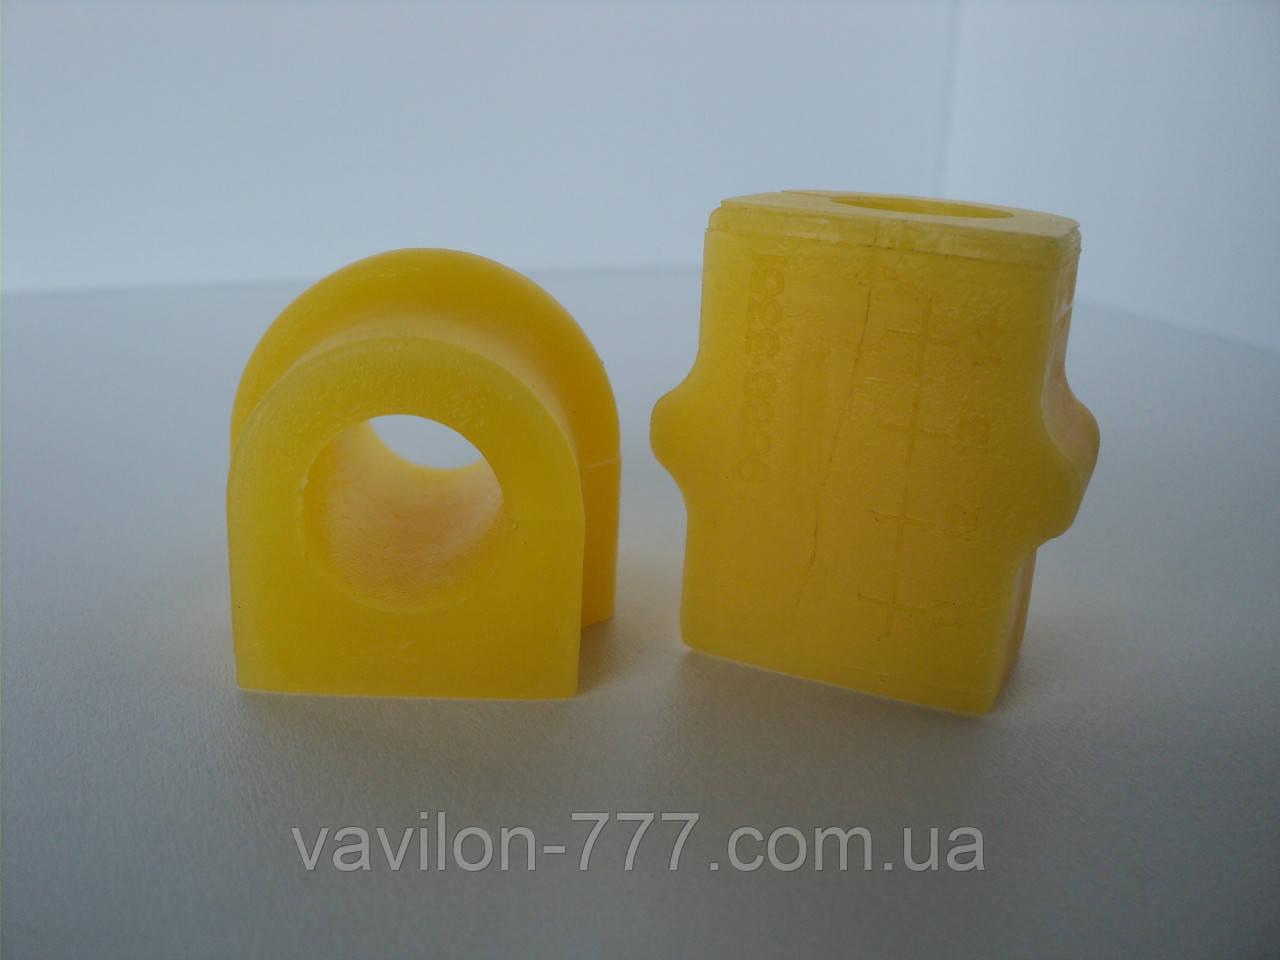 Втулка стабилизатора переднего ID=17 мм AVEO ОЕМ 96870462 полиуретан